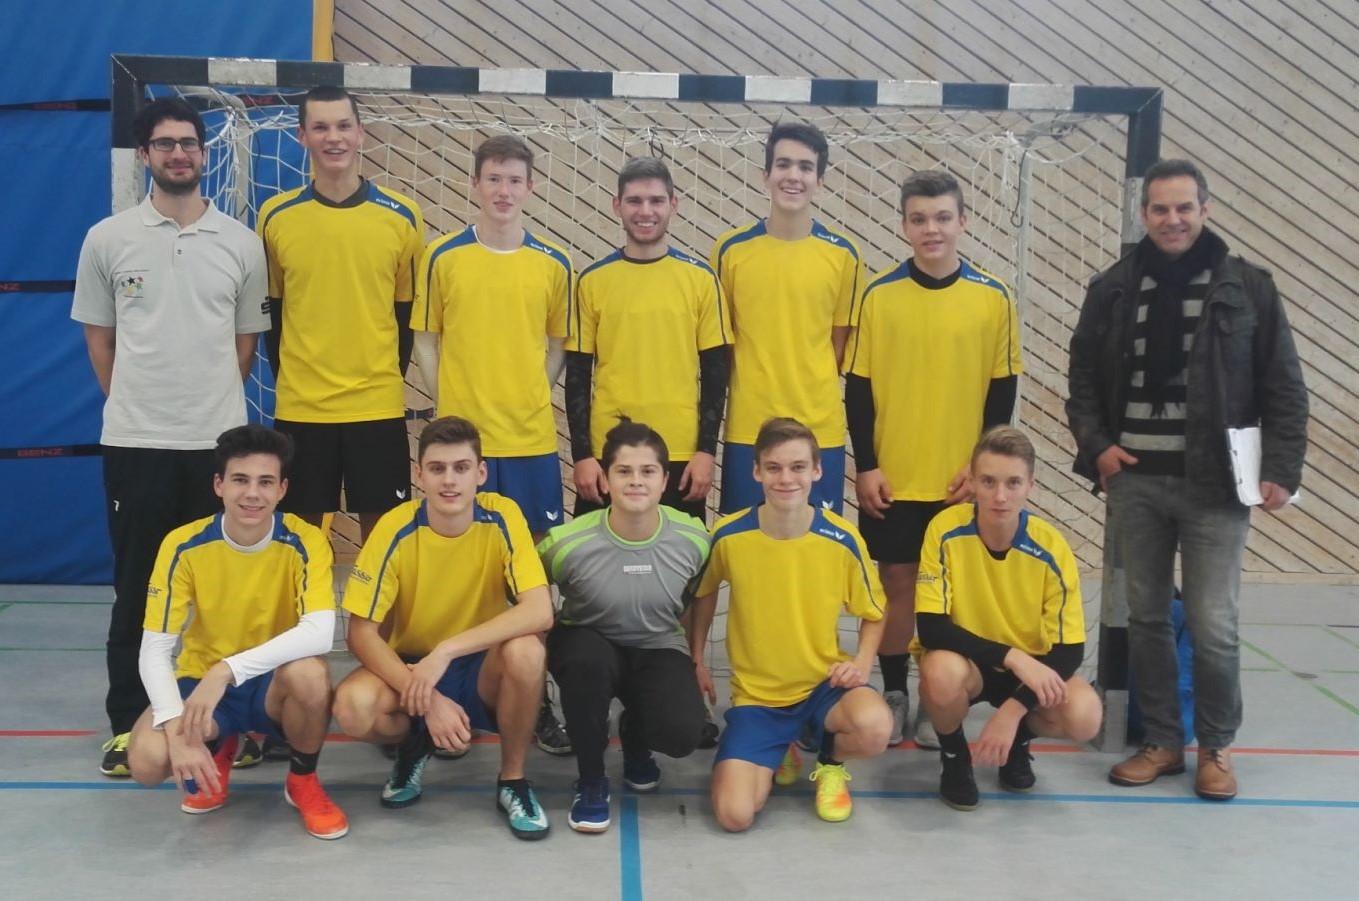 Jugend trainiert für Olympia Handball